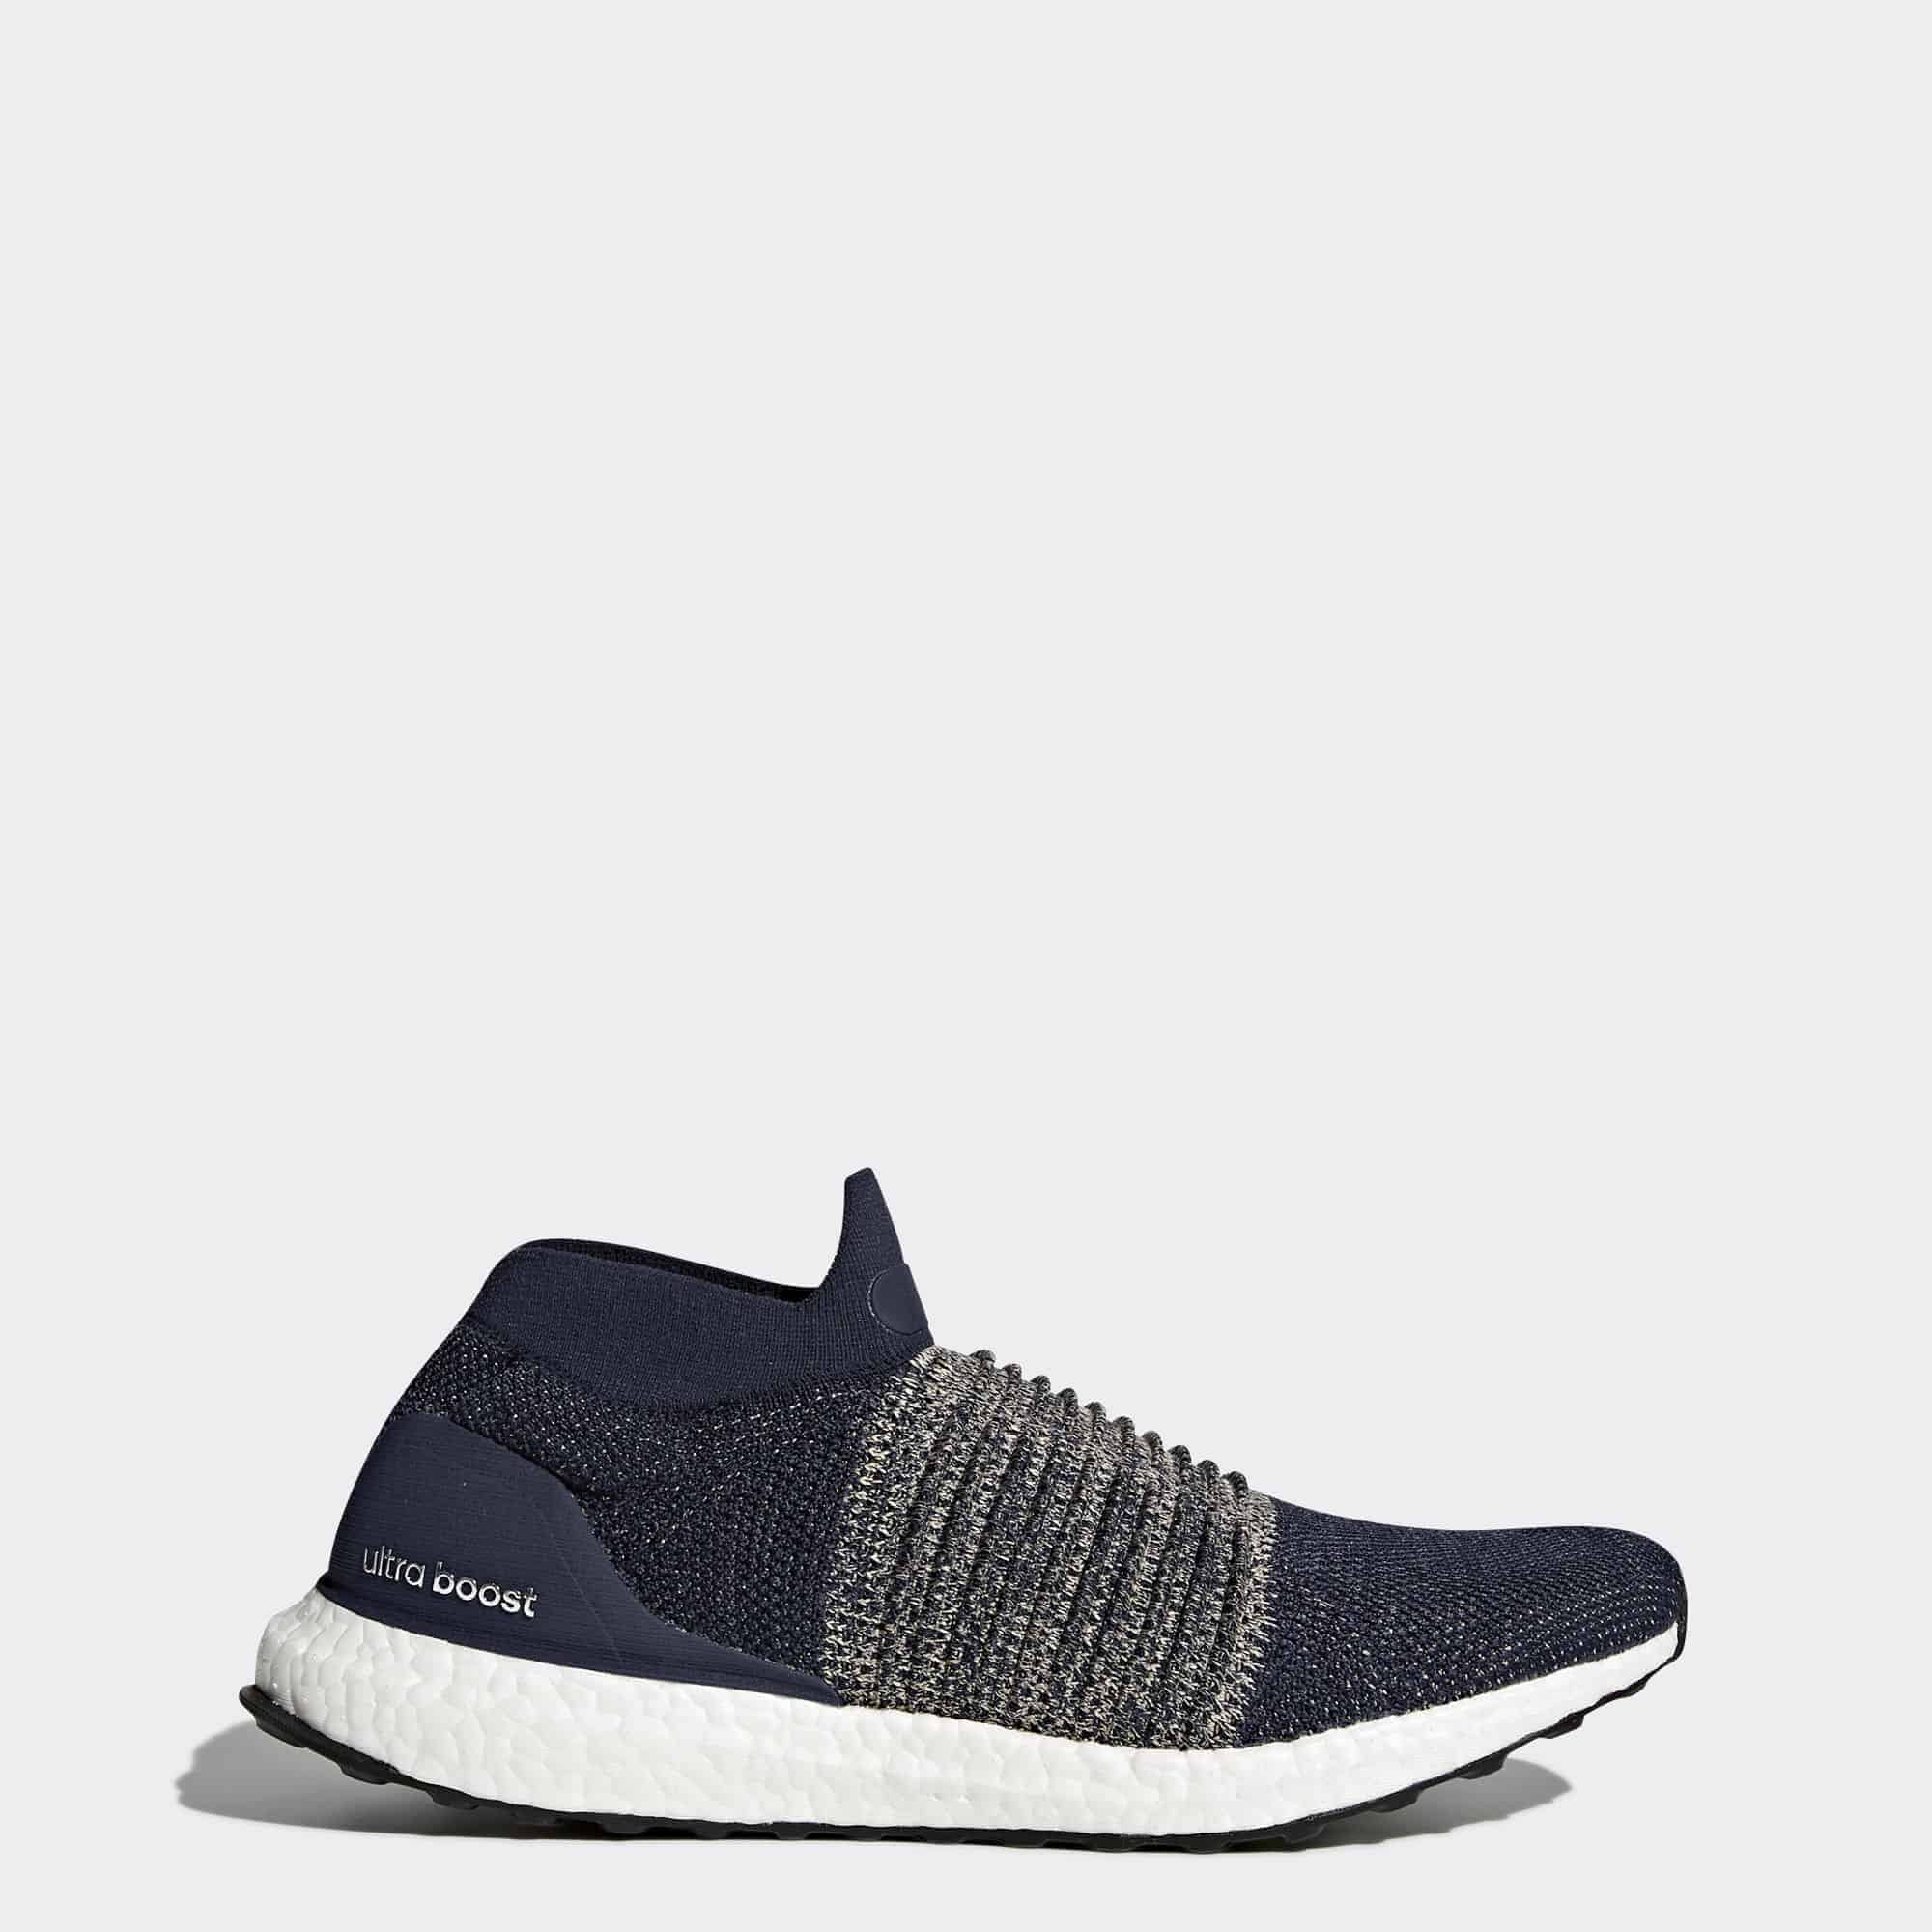 Кроссовки для бега Adidas Ultraboost Laceless мужские